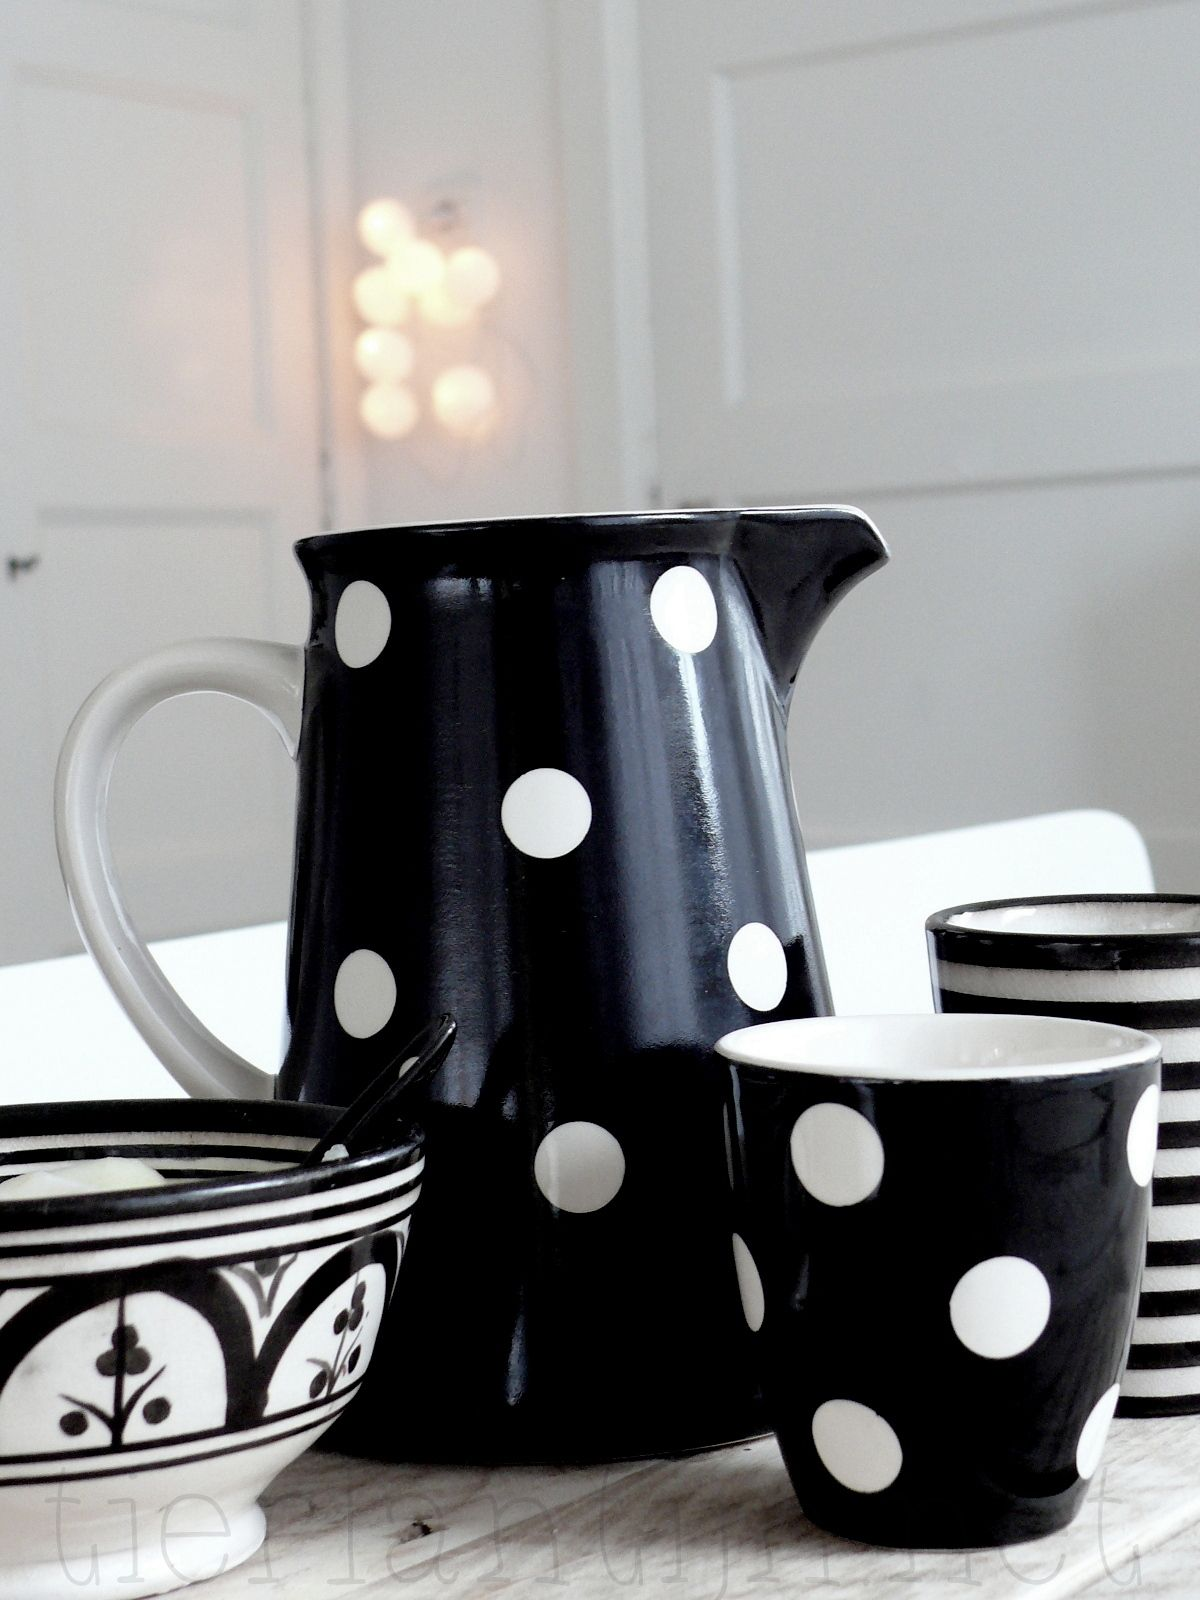 Ptite touche cosy trendy pour la cuisine black and white?